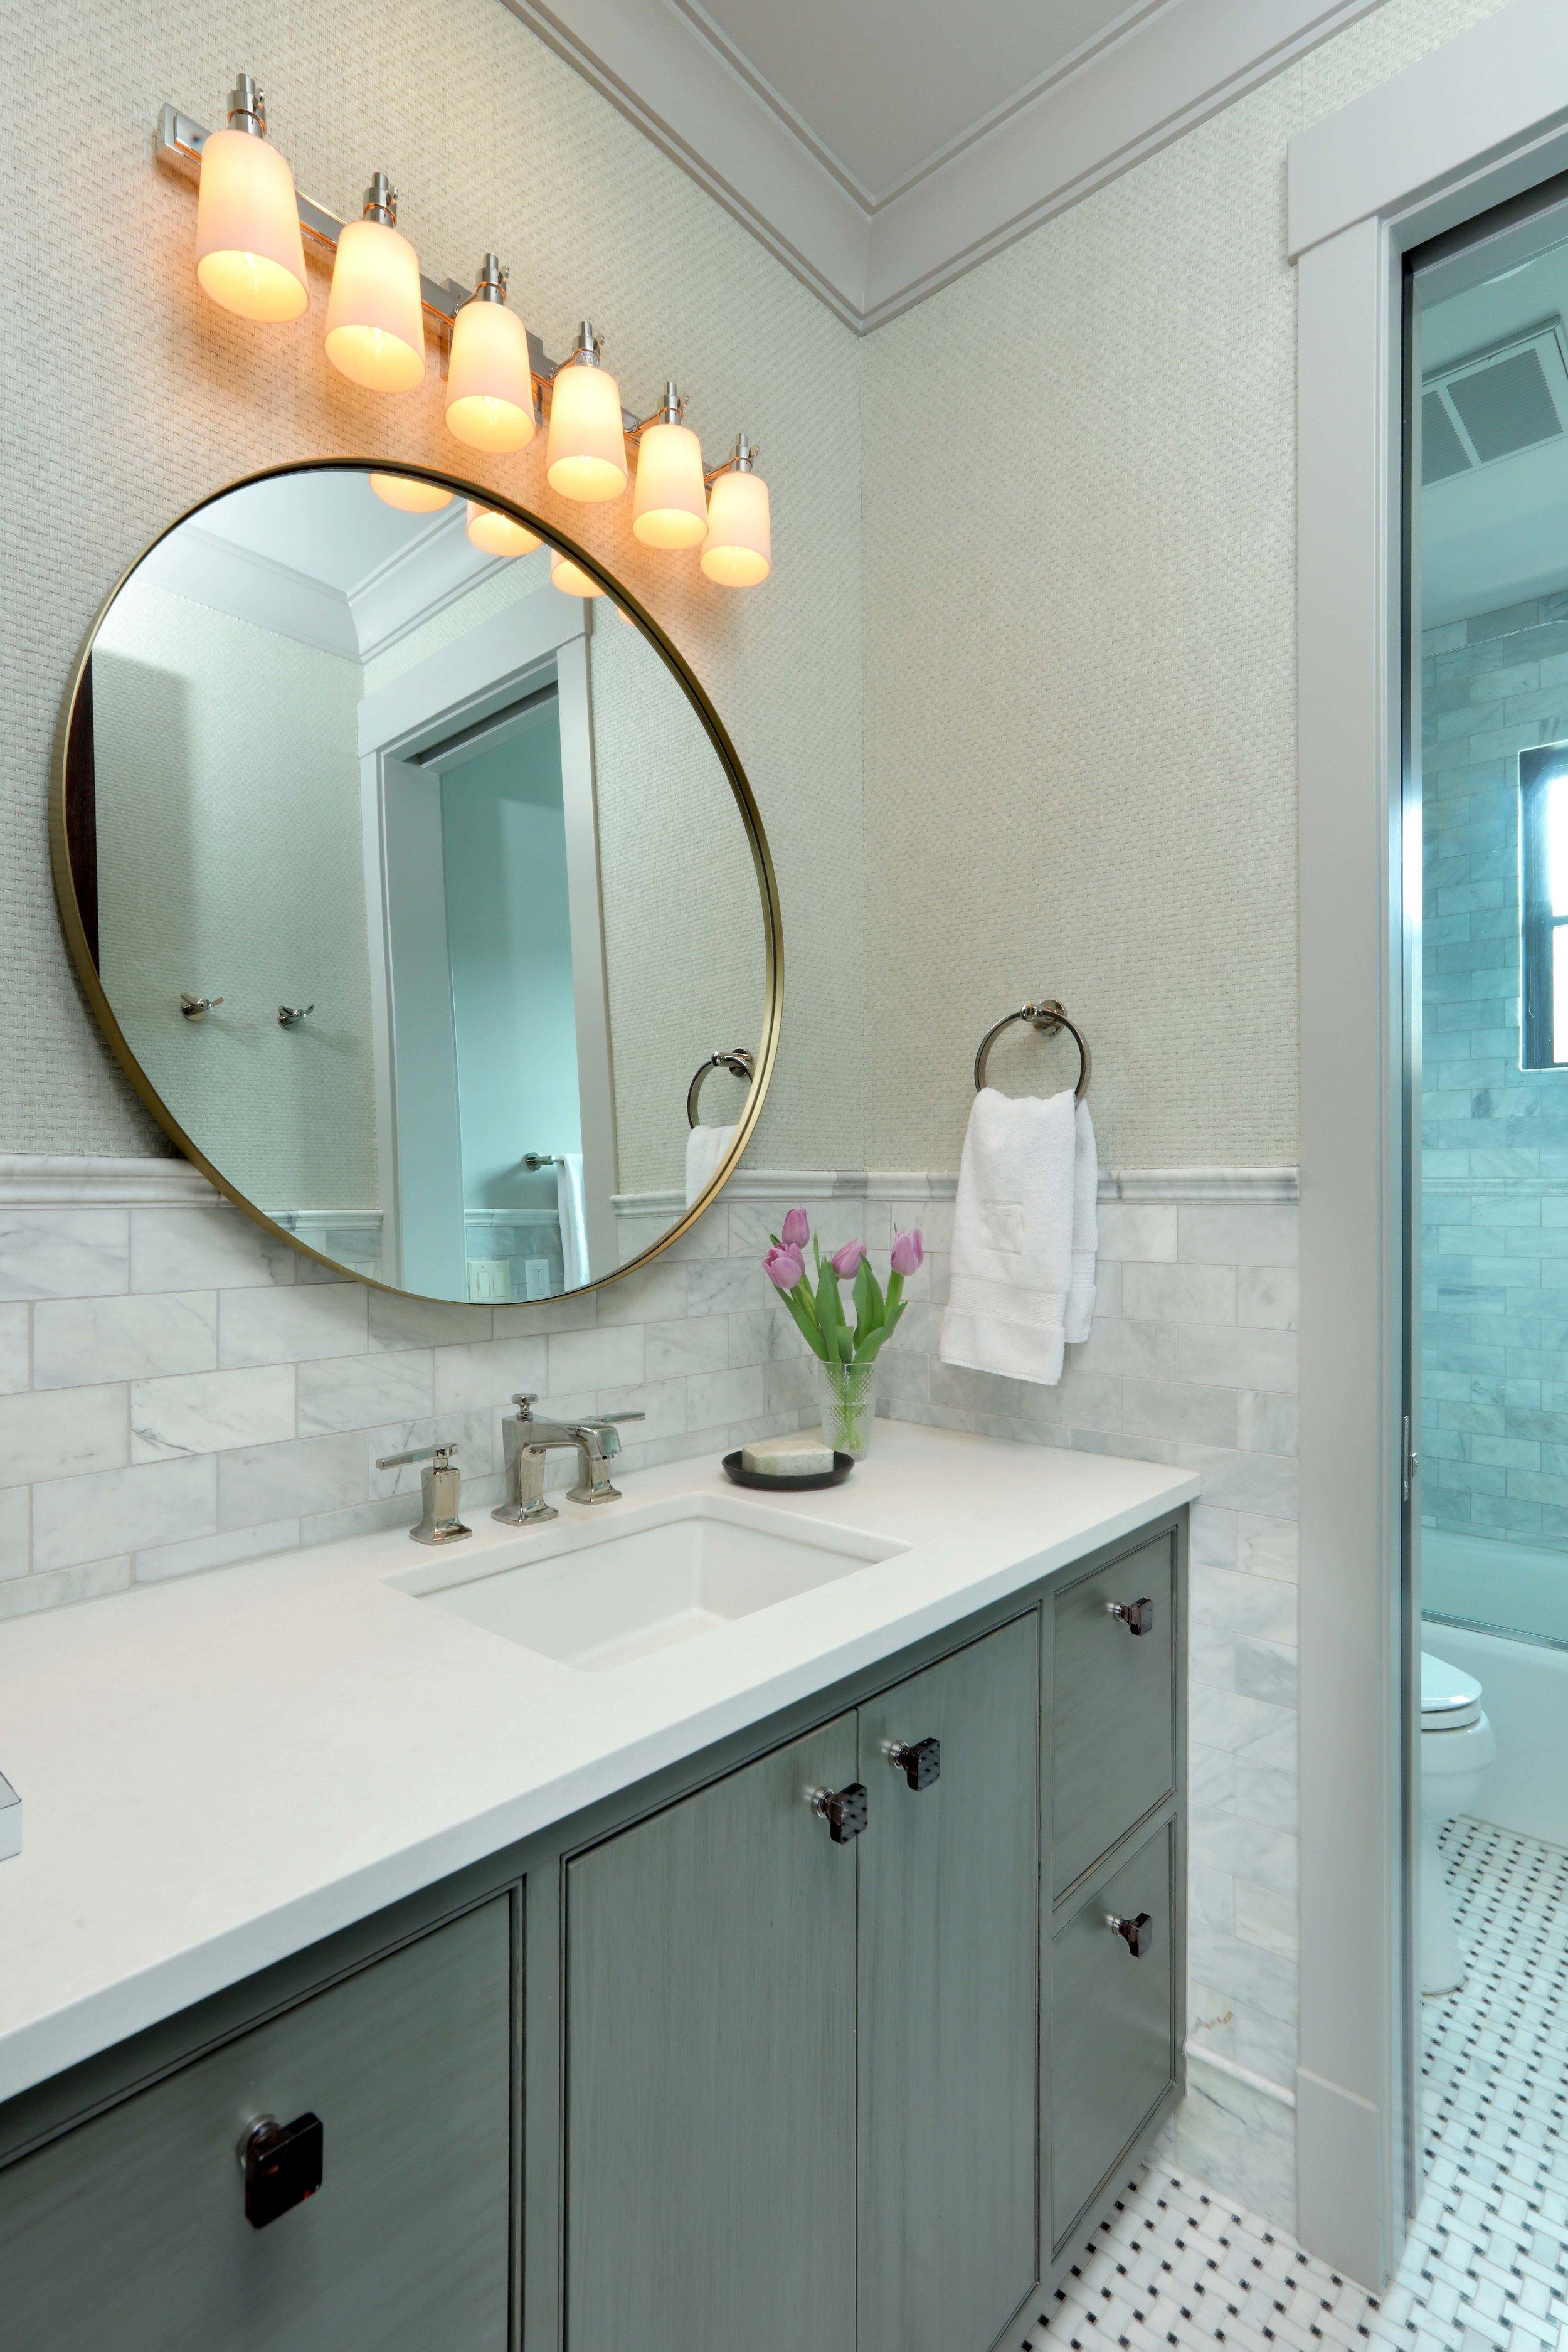 Vision-Interiors-Visbeen-Showroom-Grand-Rapids-Residence-Bathroom.jpg